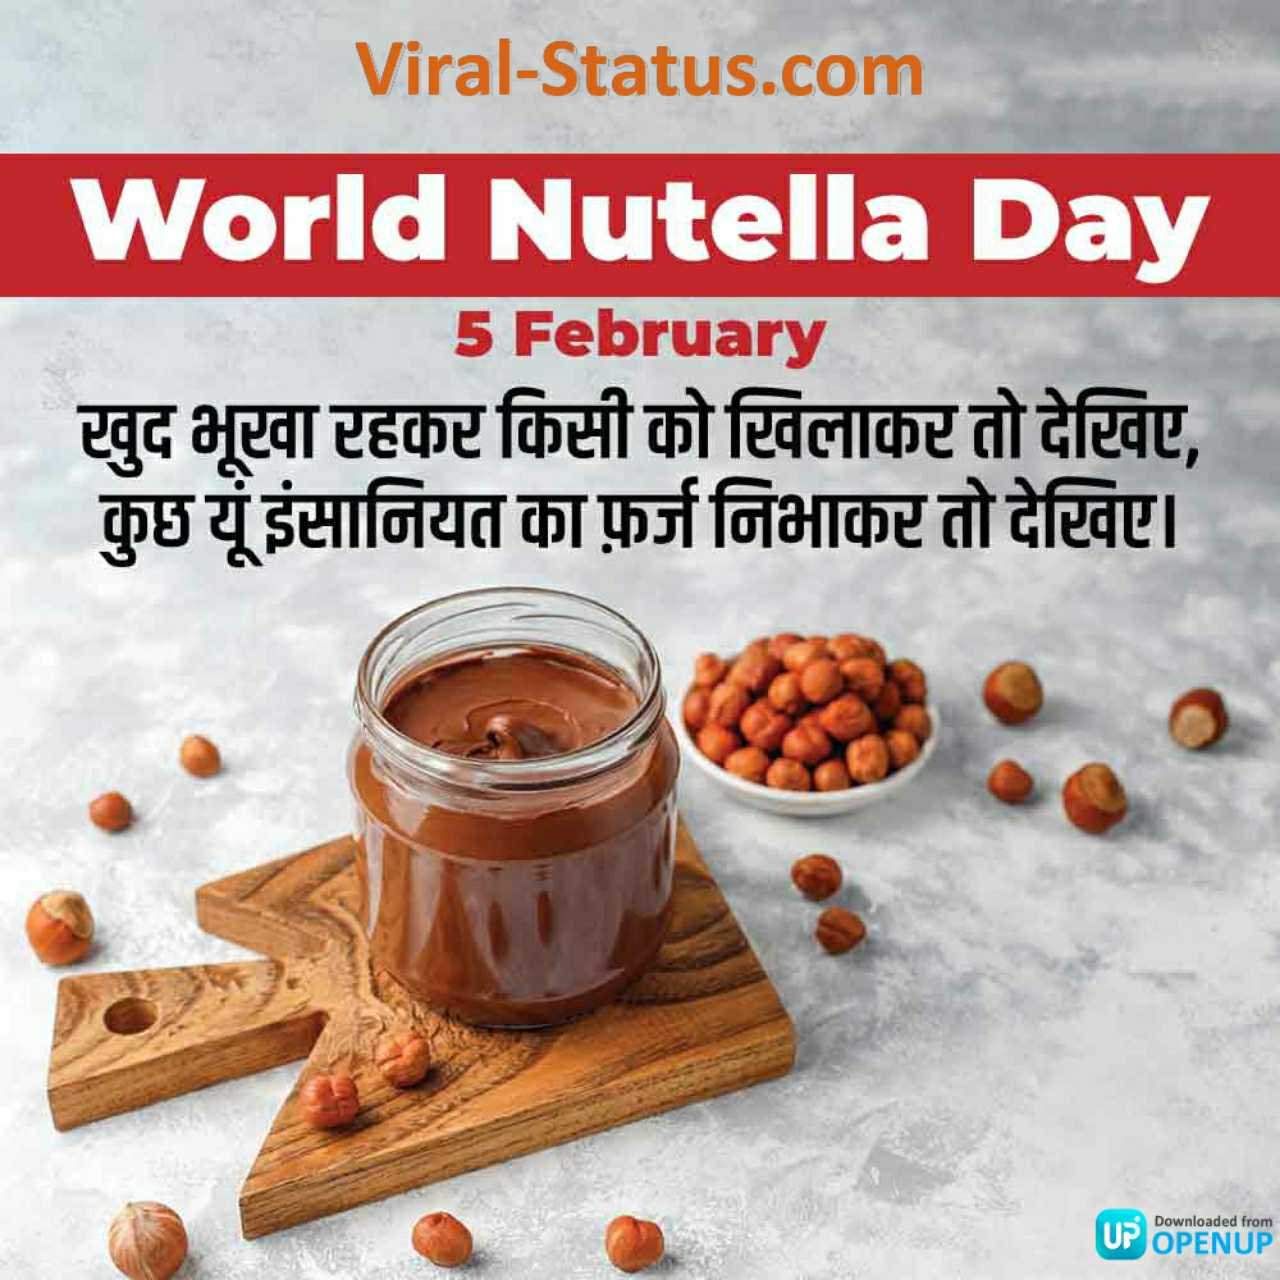 world nutella day